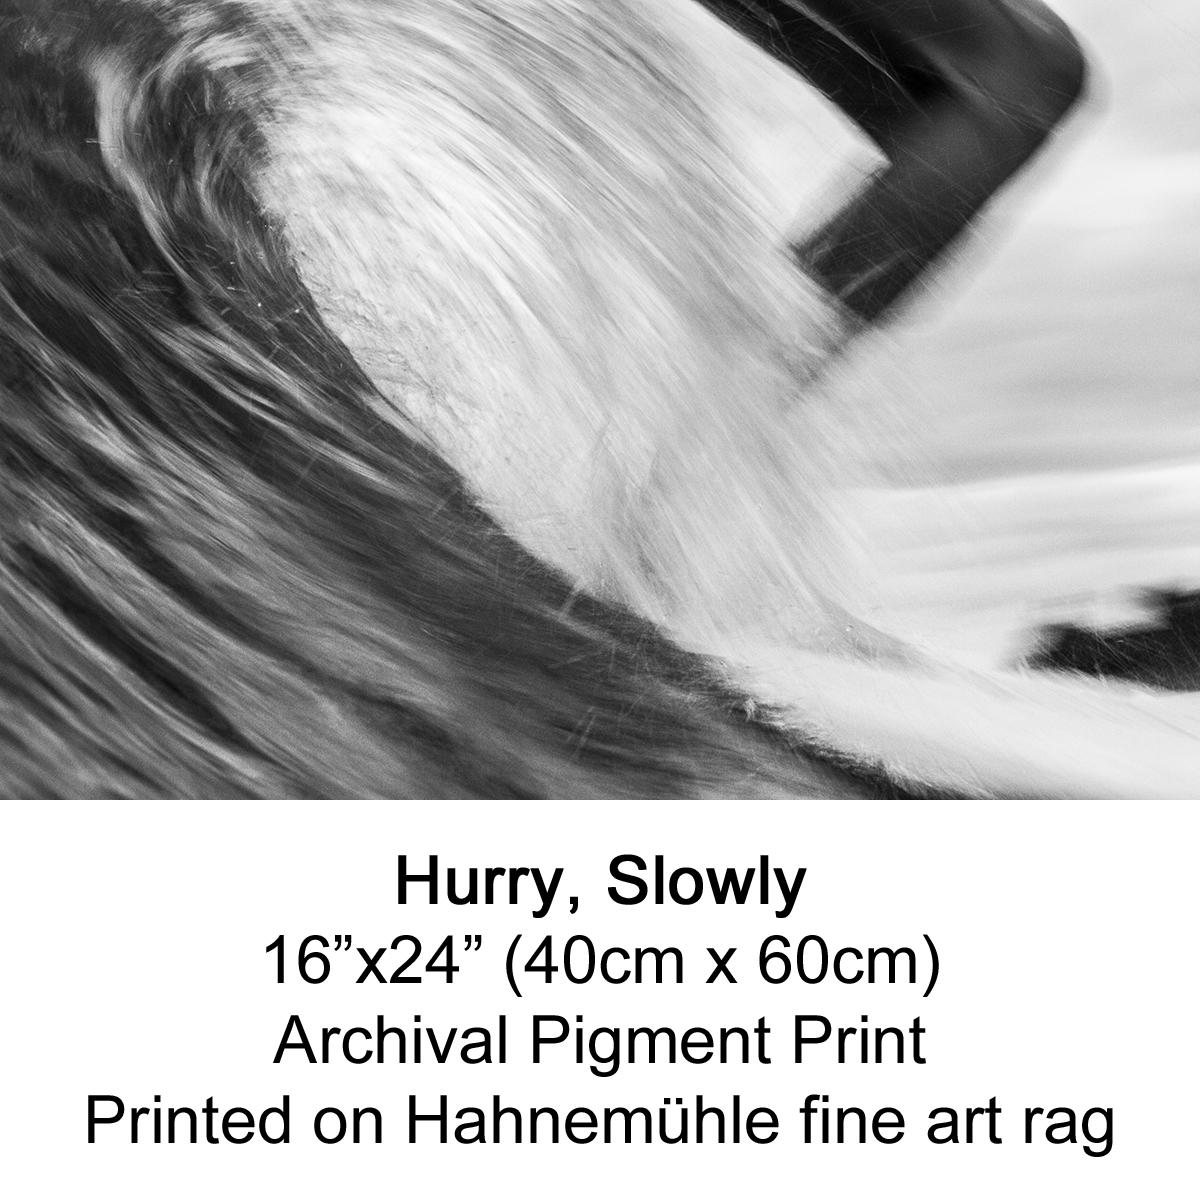 Hurry Slowly by fran miller.jpg